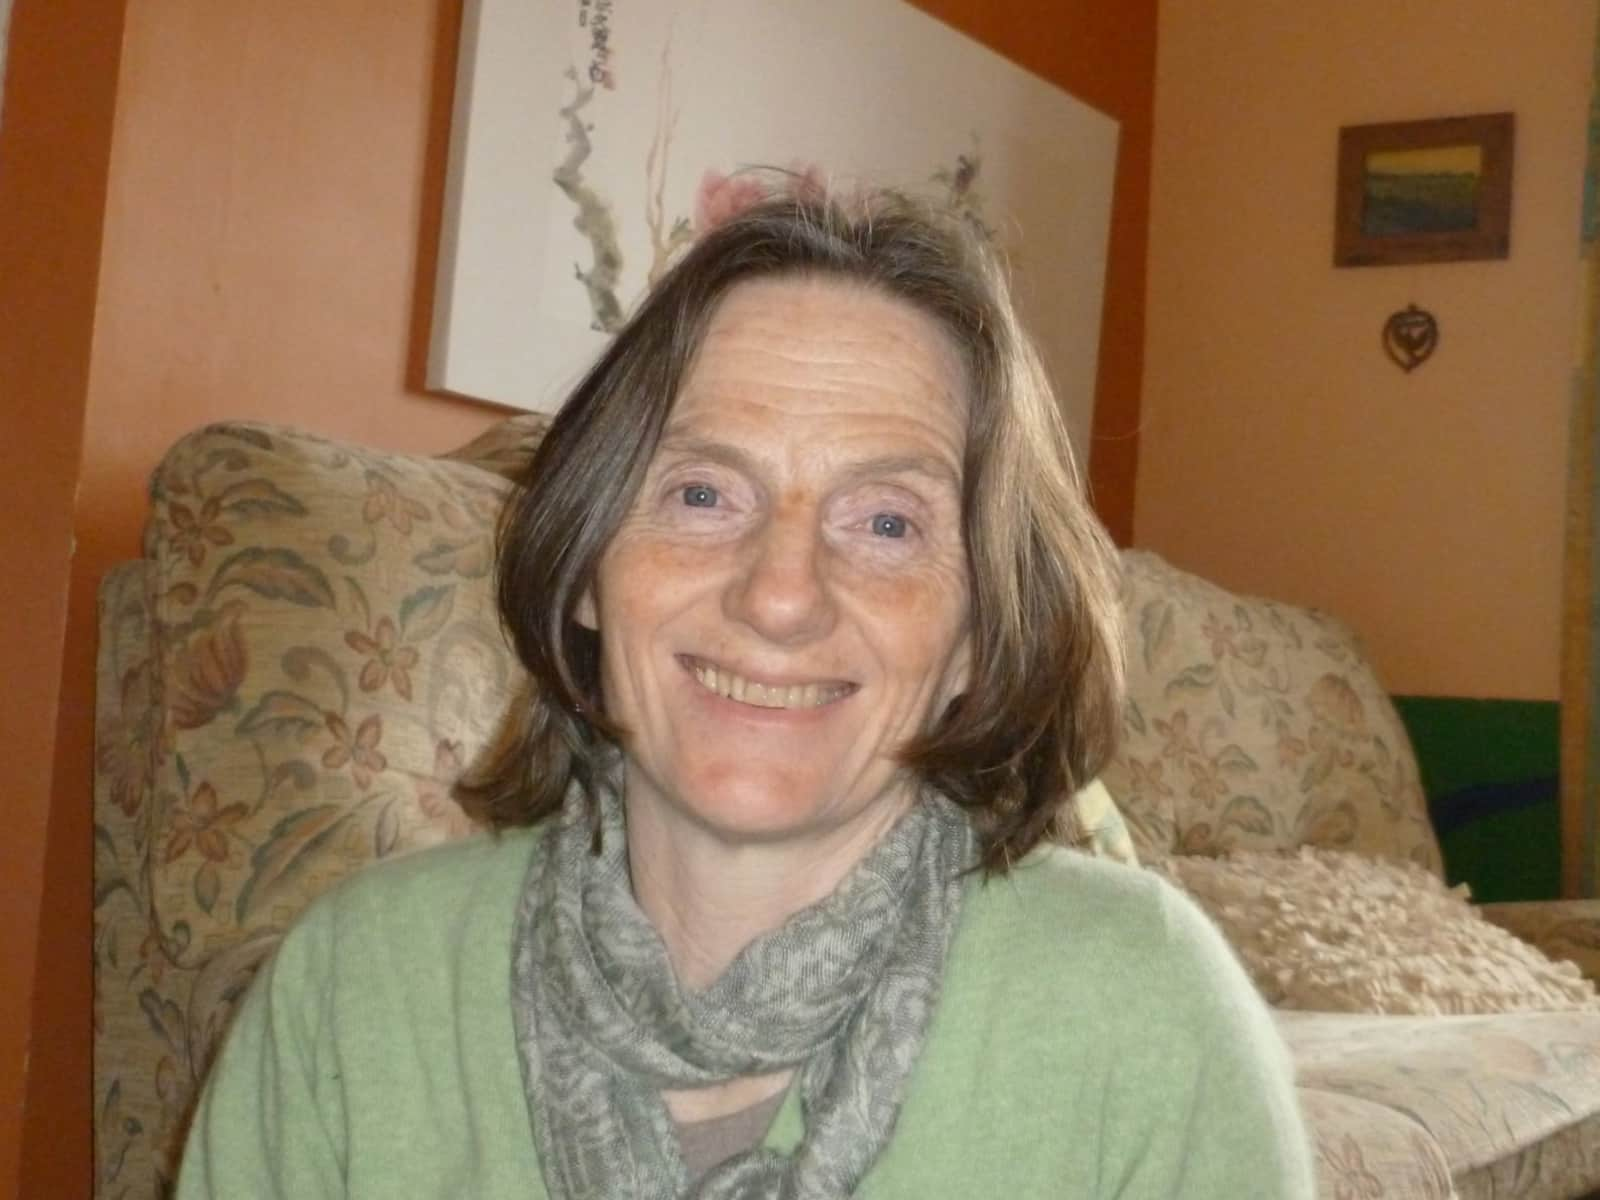 Karen from Brampton, United Kingdom